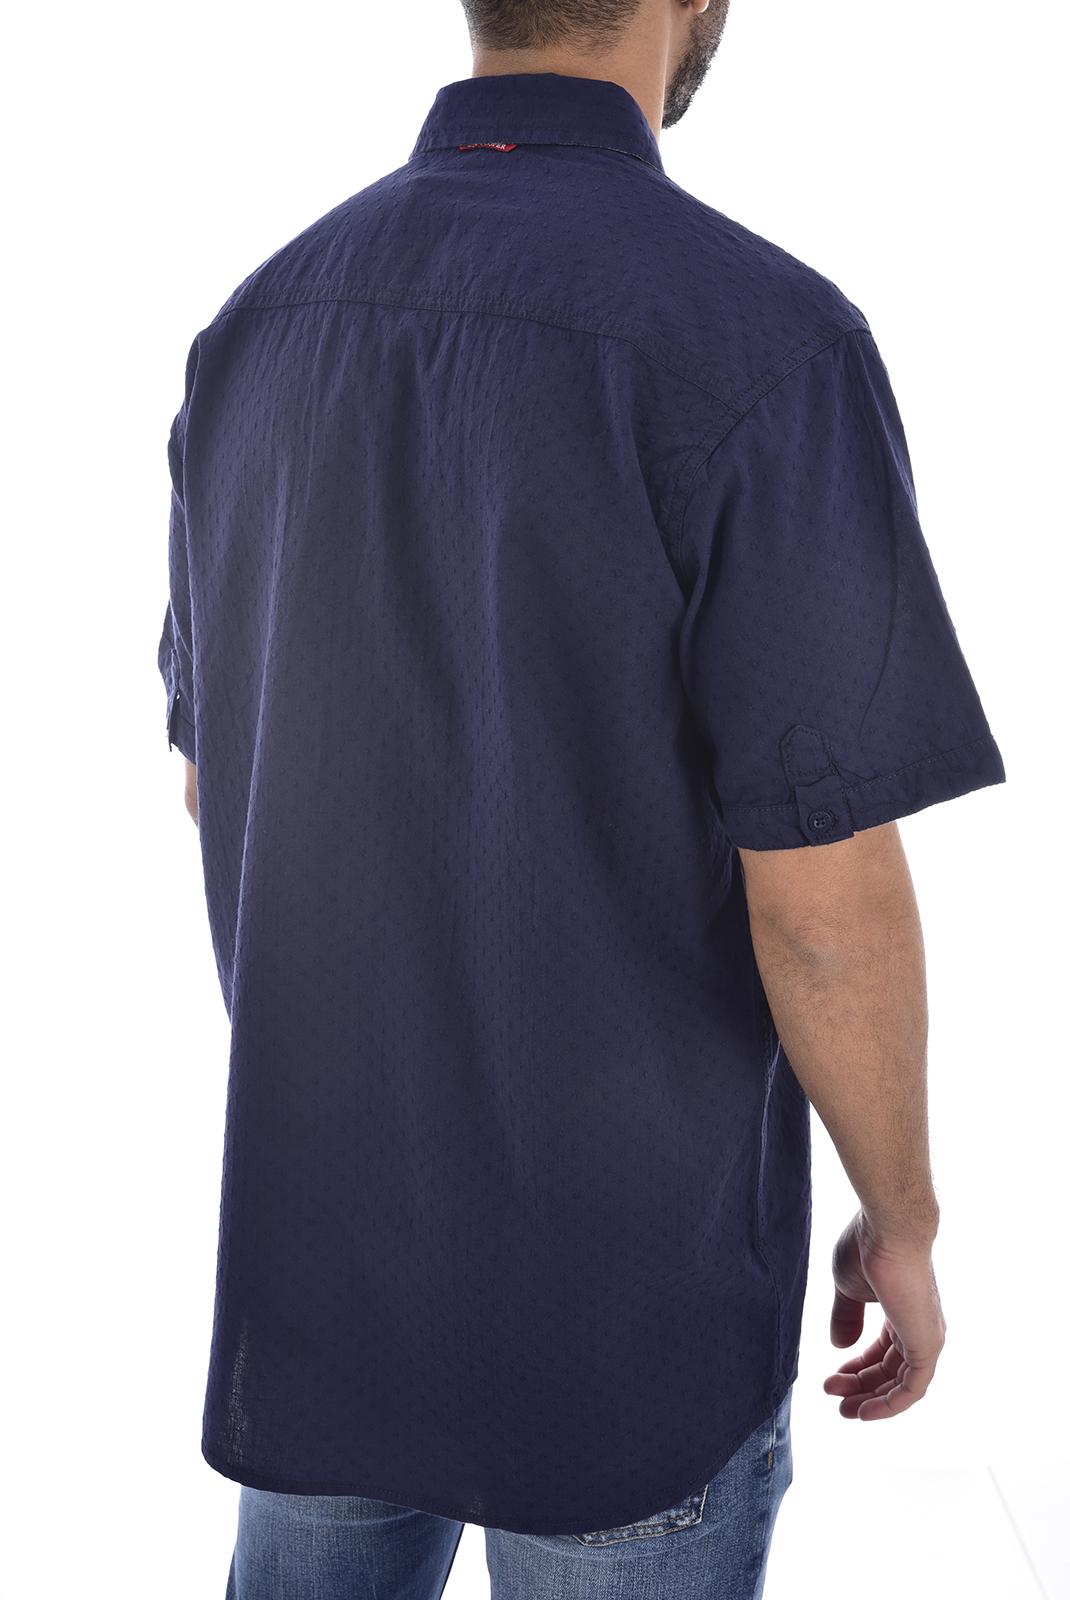 Chemises manches courtes  Lee cooper DODGER DARK NAVY